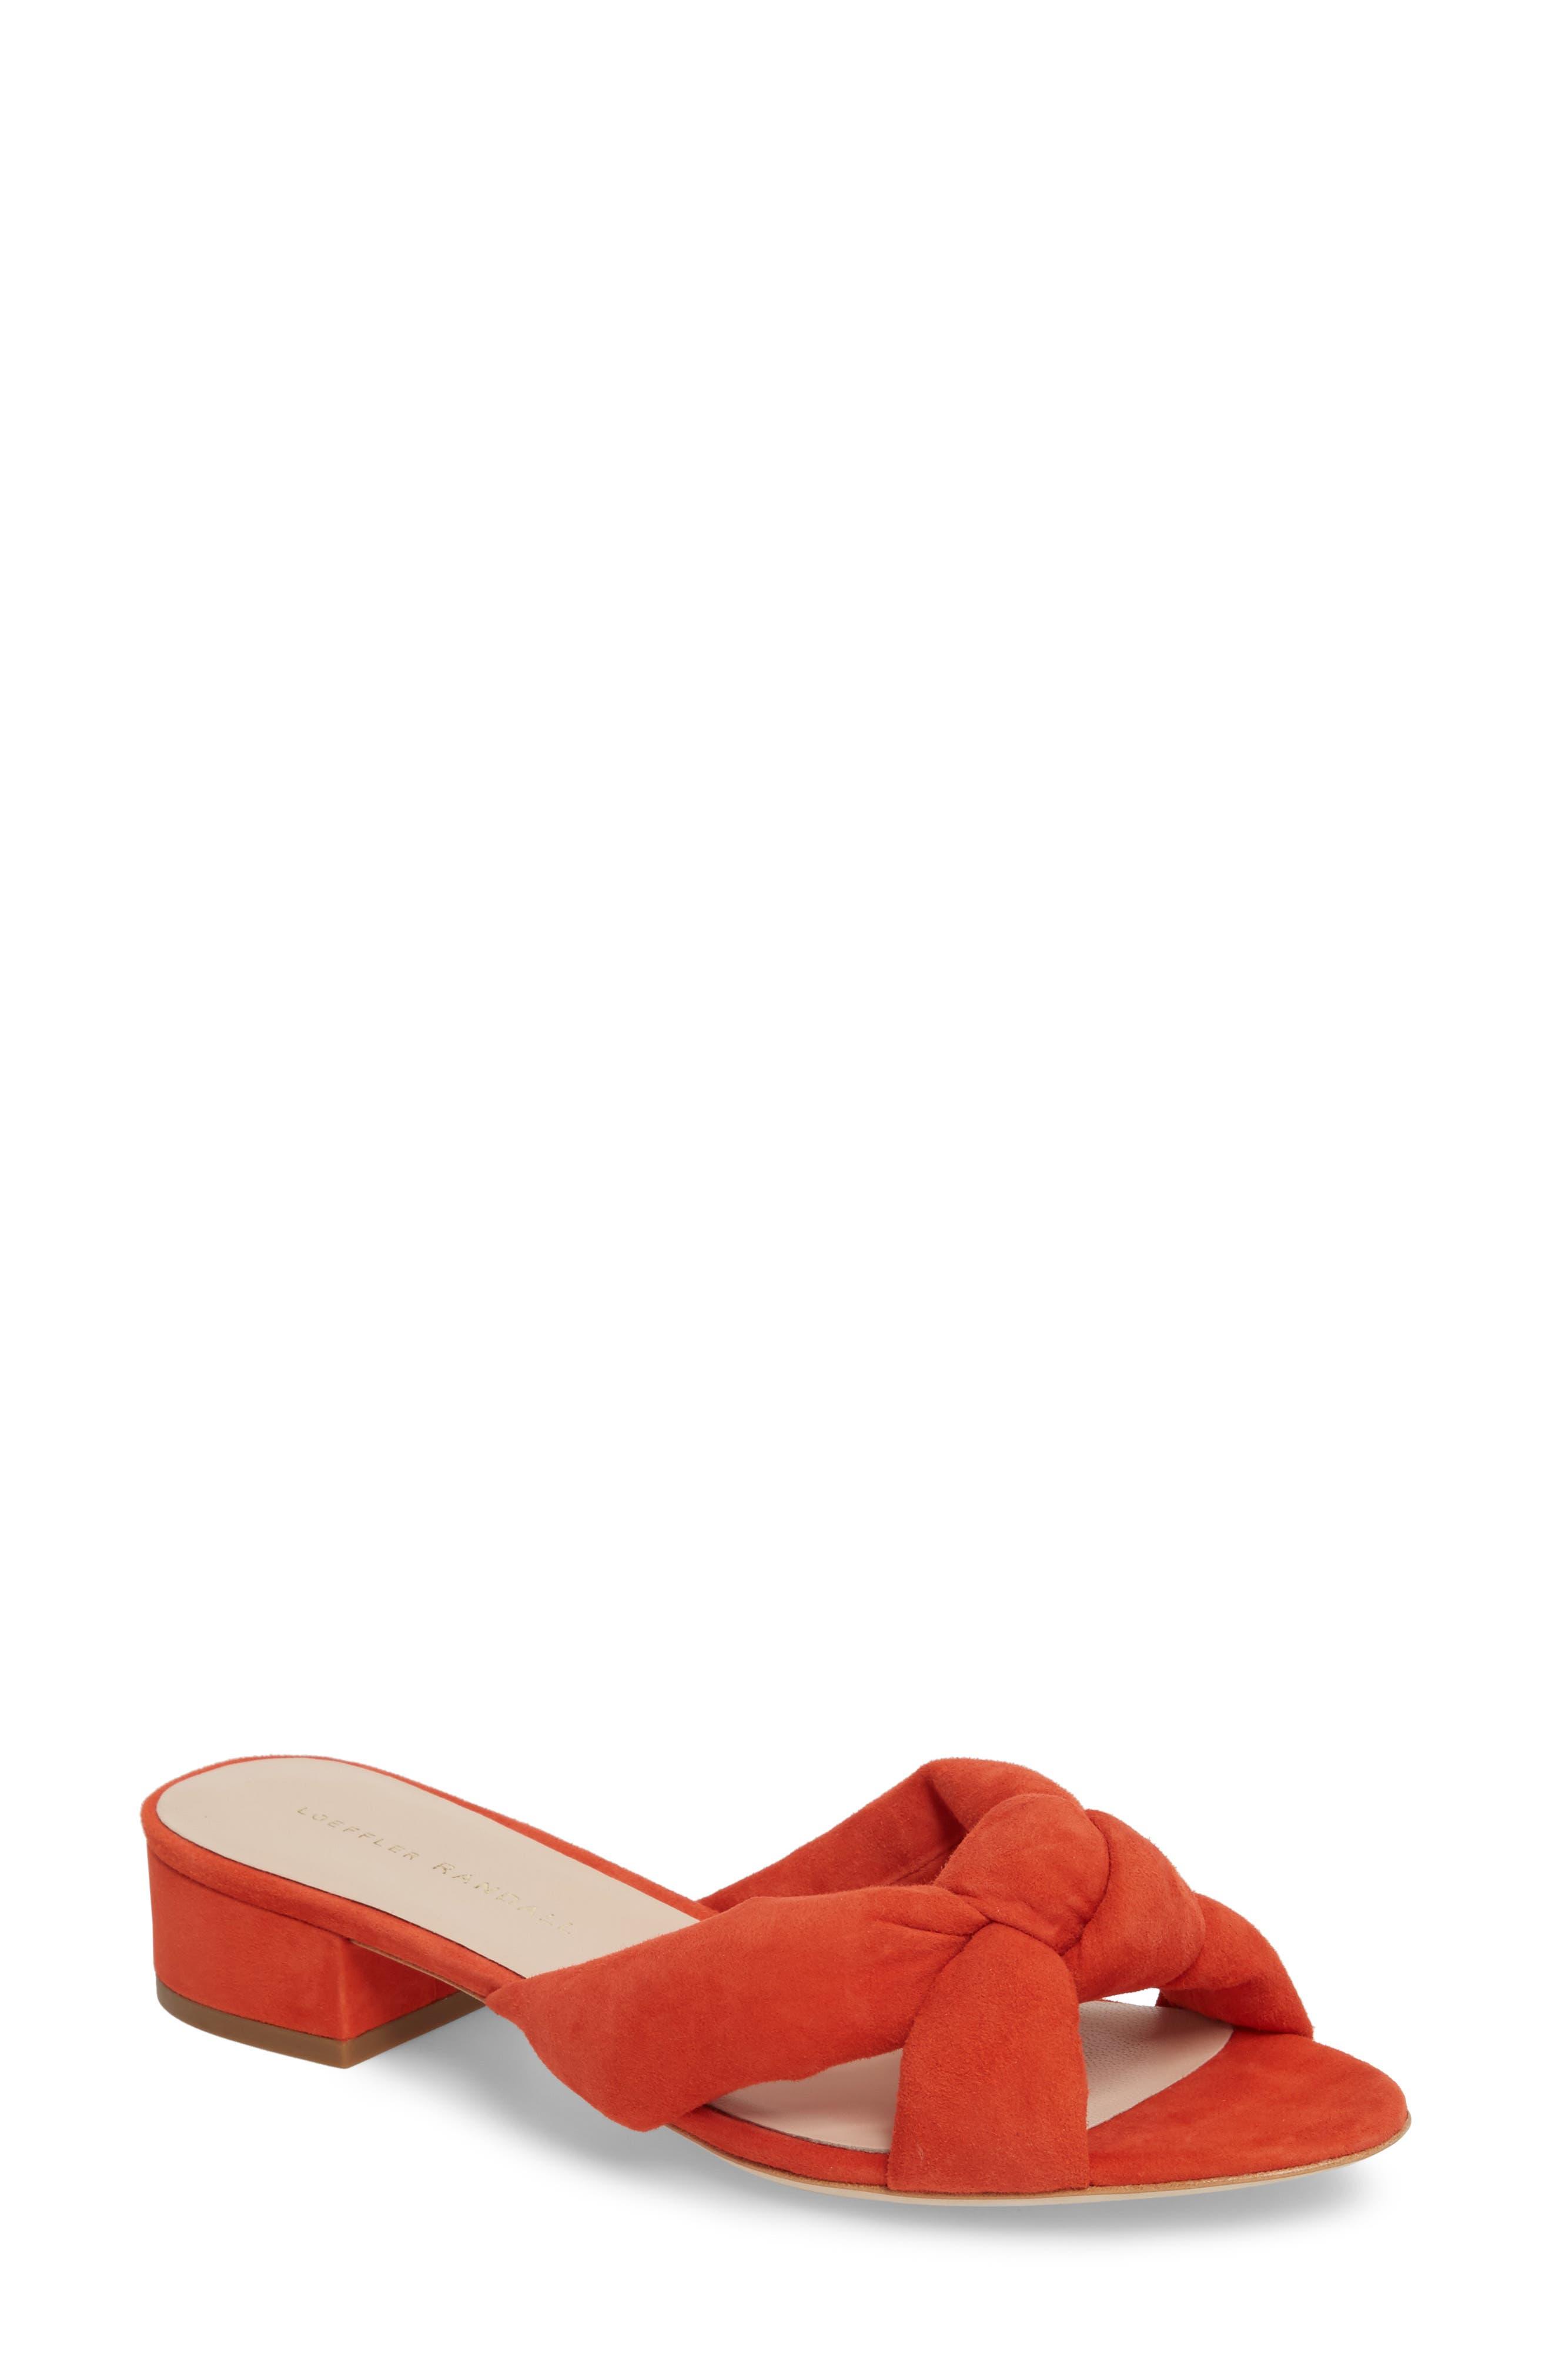 Elsie Knotted Slide Sandal,                             Main thumbnail 1, color,                             Persimmon